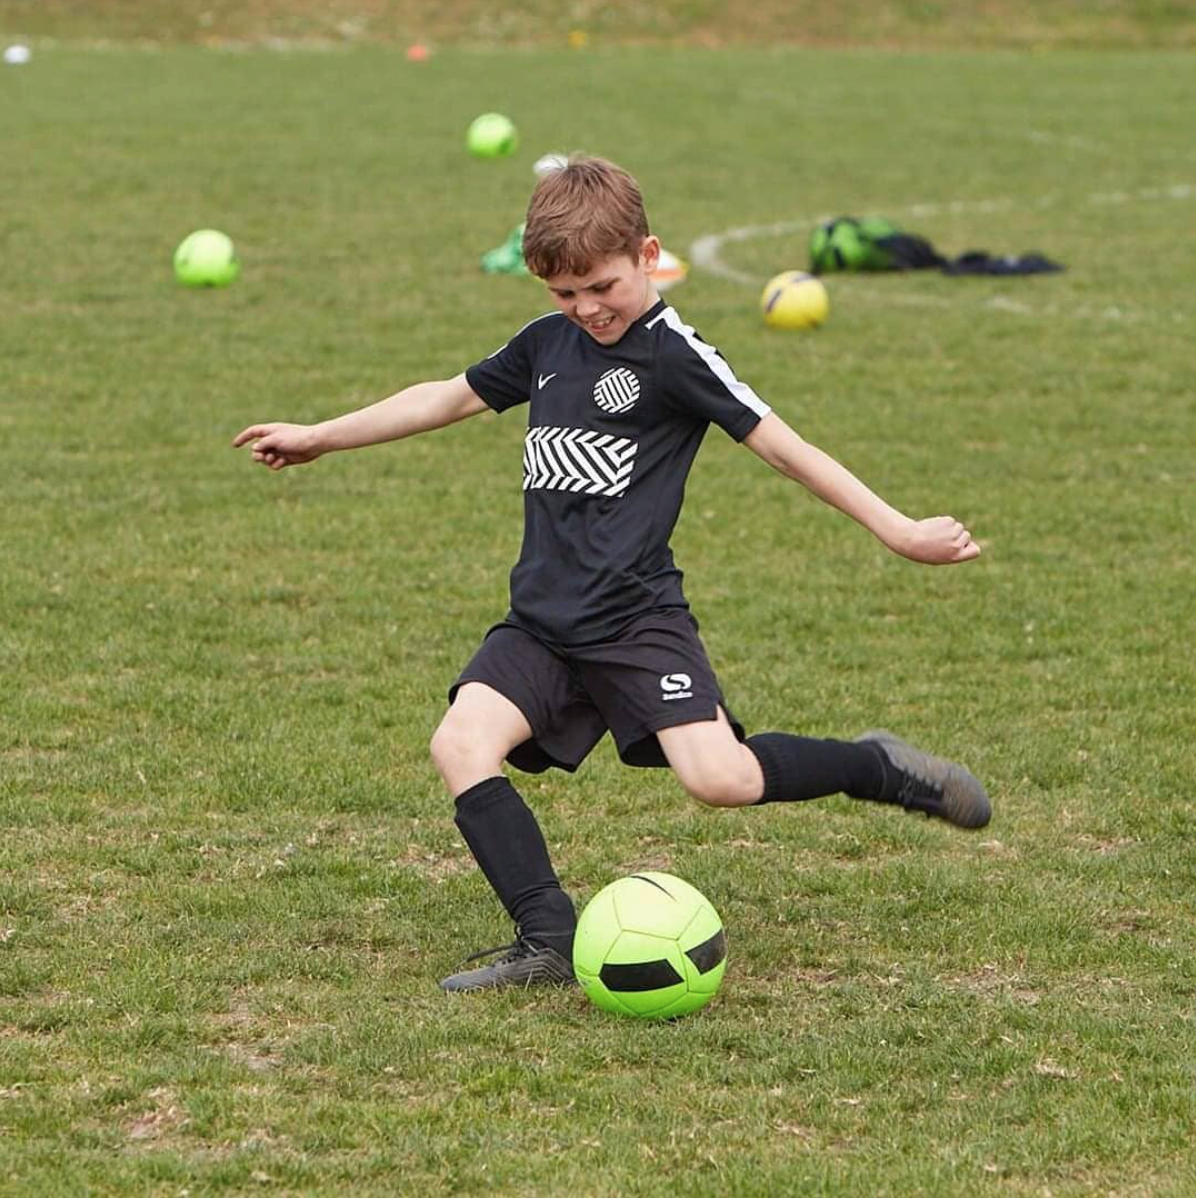 Boy Kicking Football During PSC Football Training For Kids